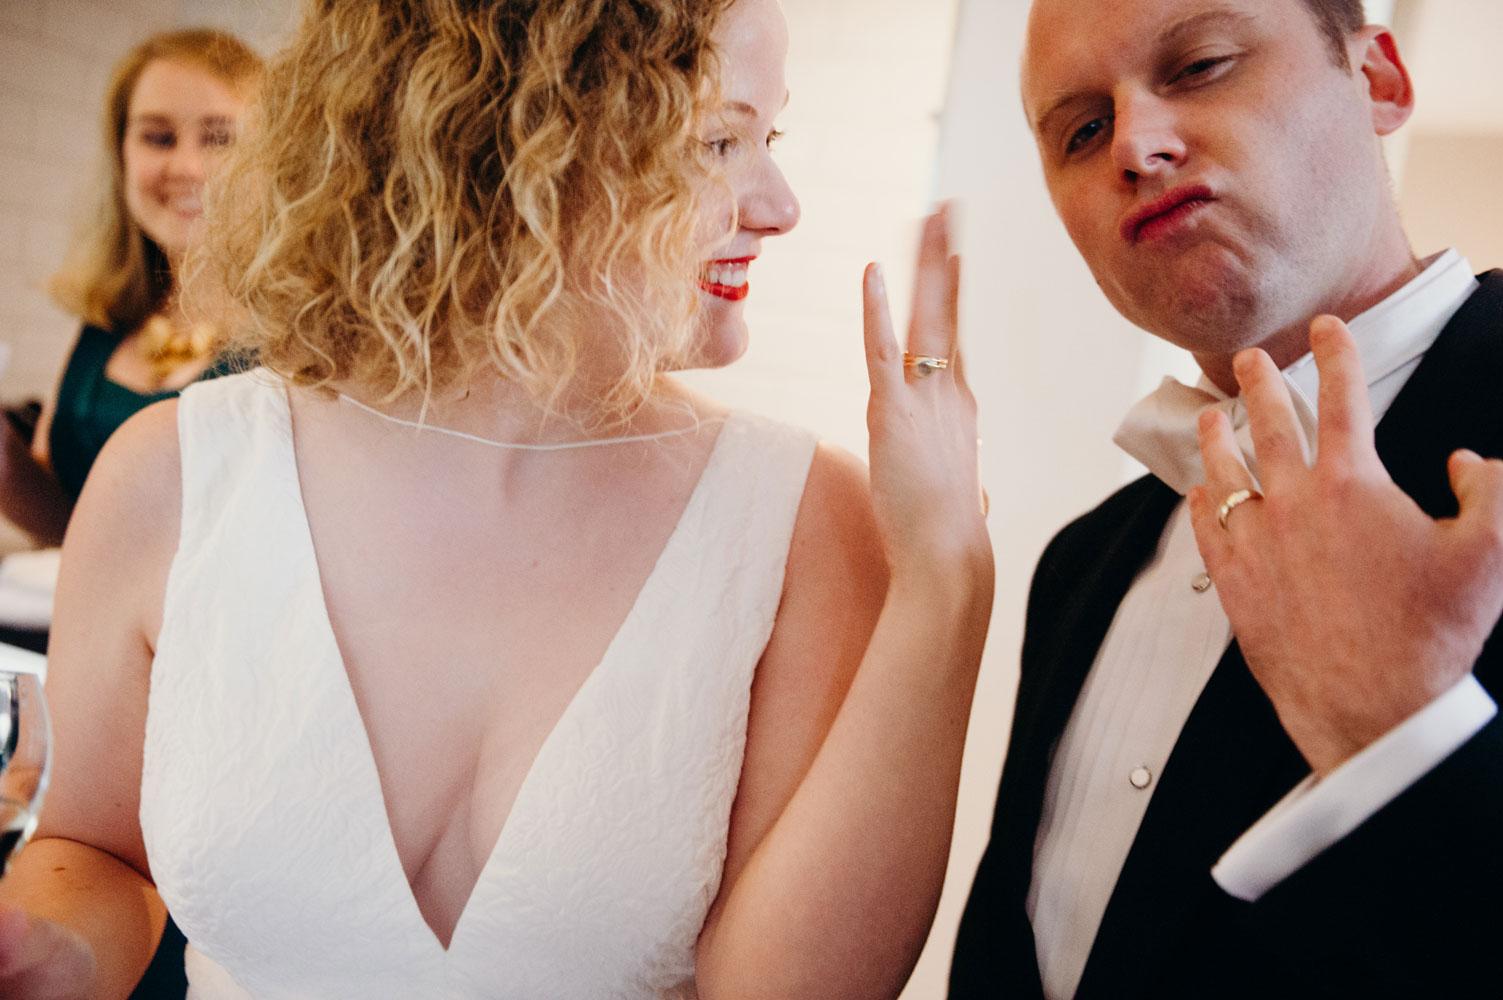 wedding_photographer_zermatt_45.jpg